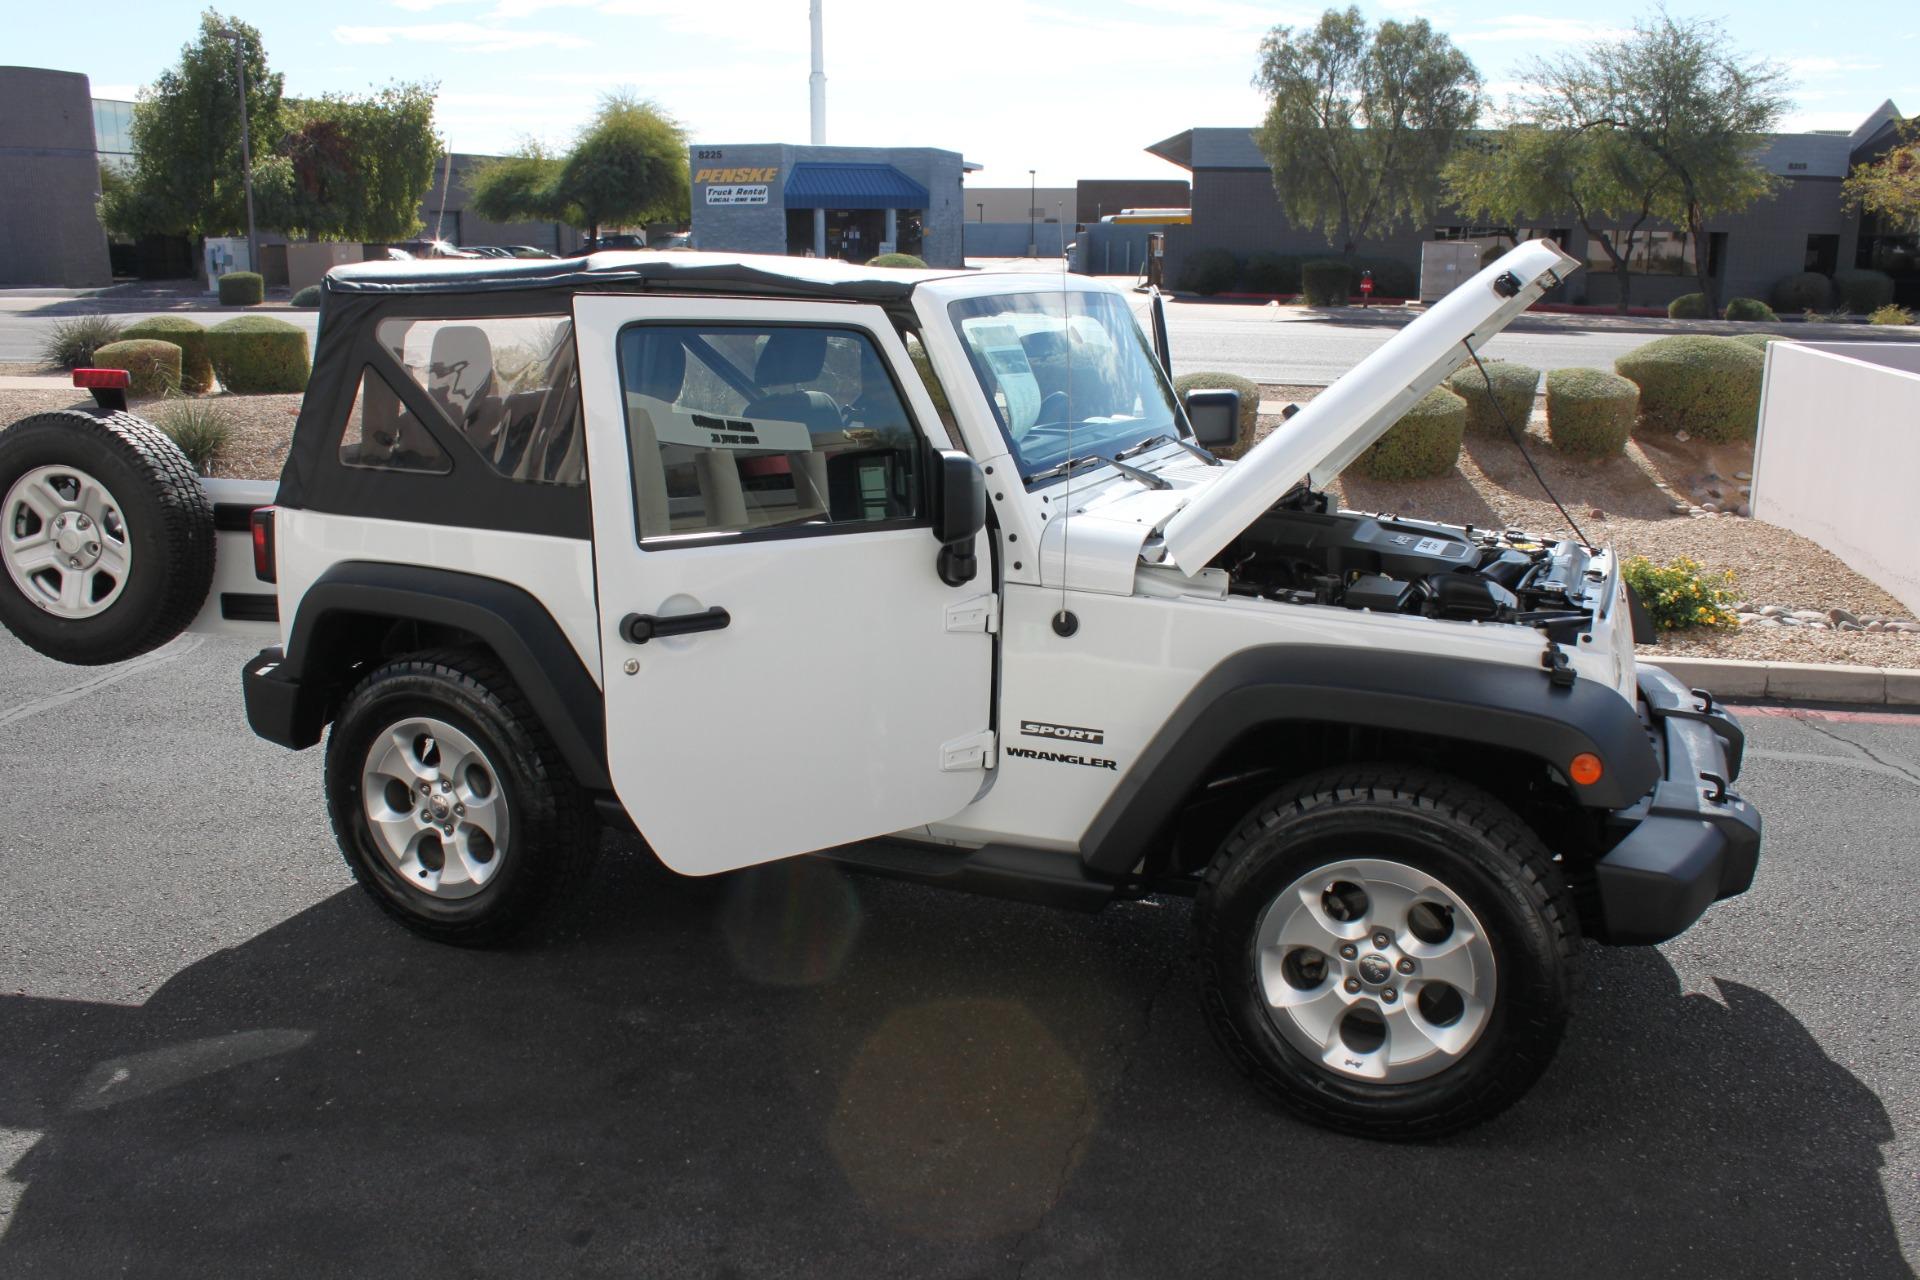 Used-2012-Jeep-Wrangler-Sport-4X4-Chevelle